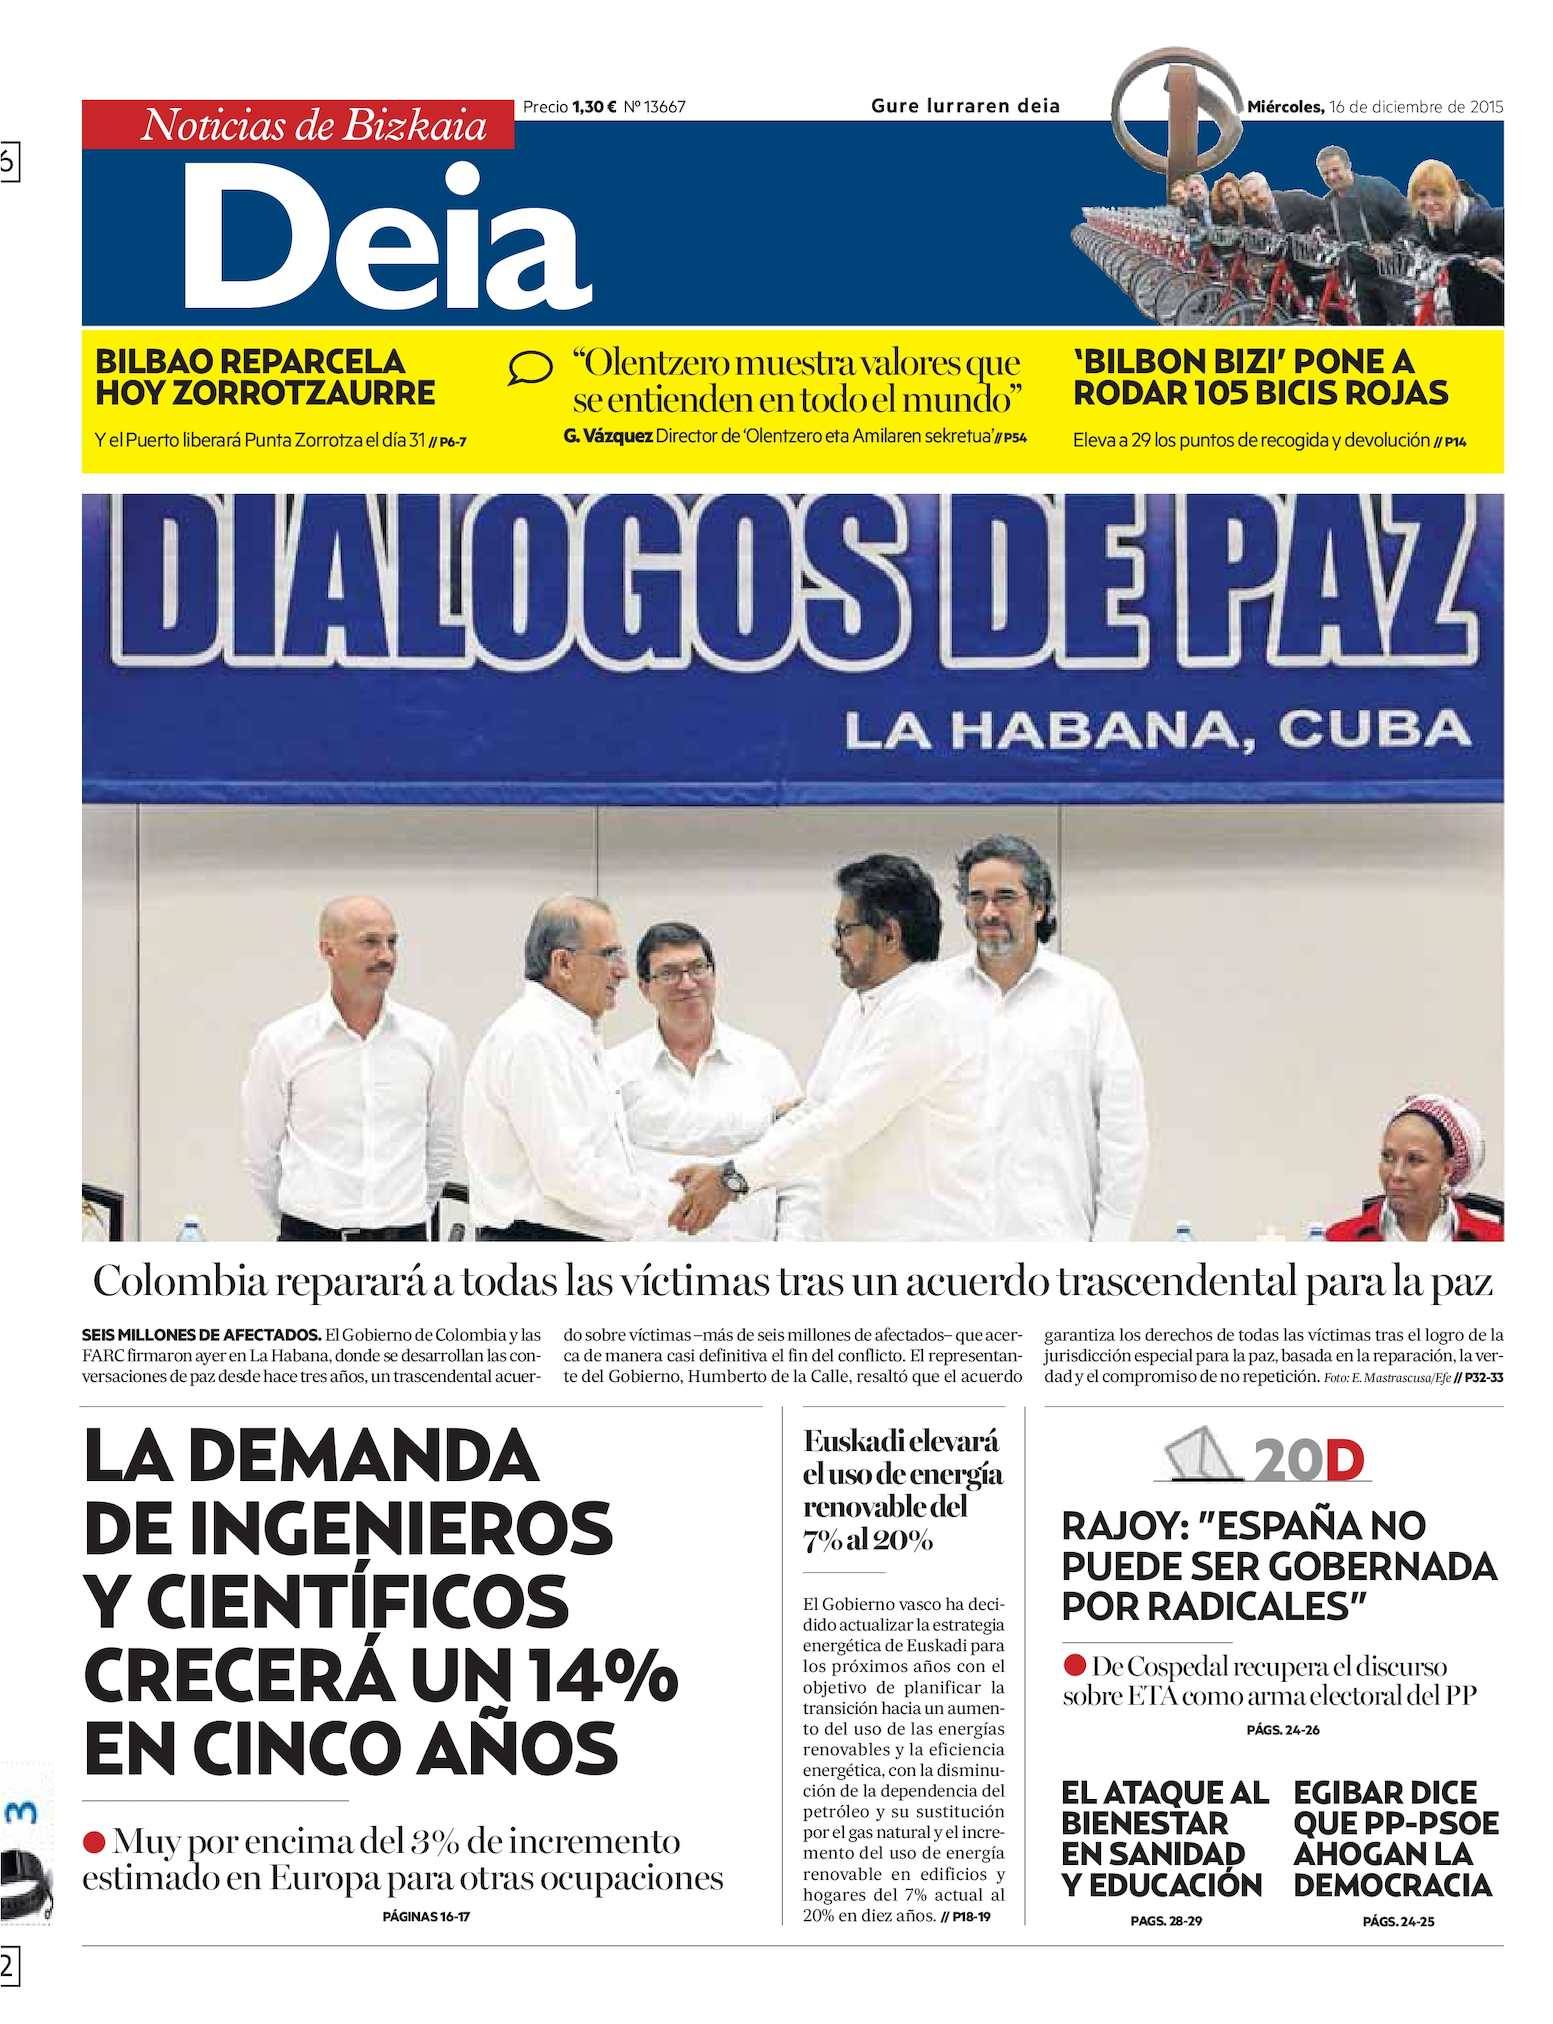 Calaméo - Deia 20151216